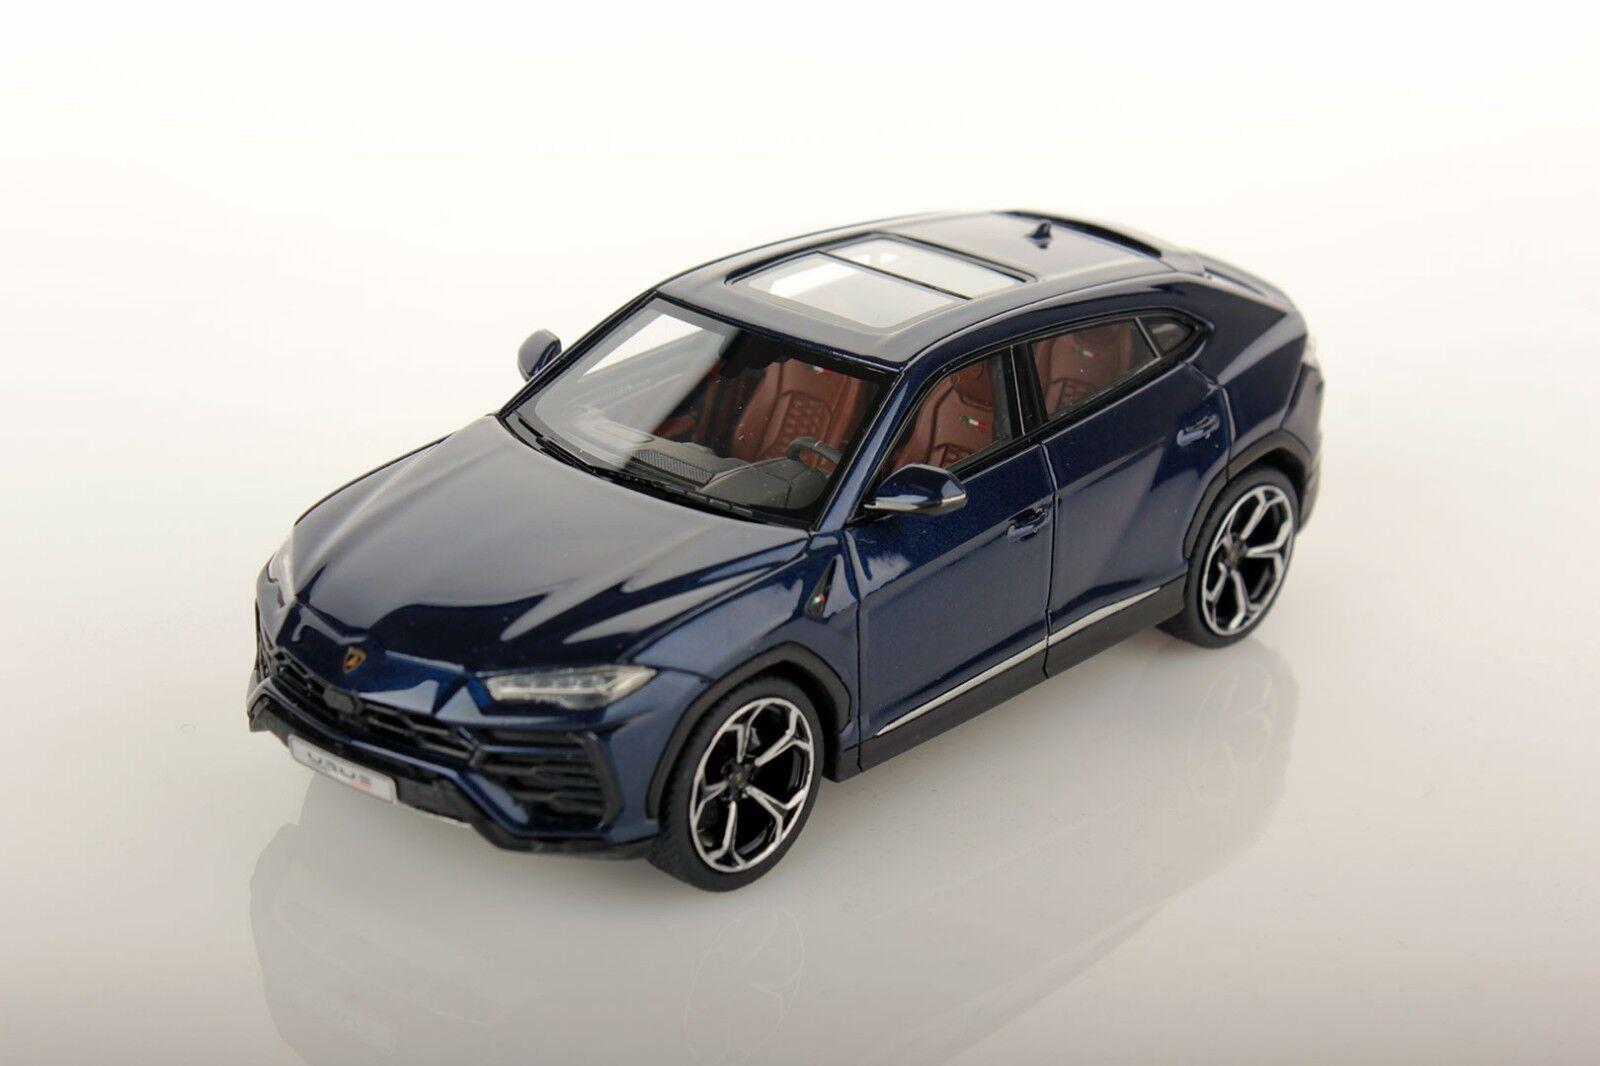 Look Smart 1 43 Lamborghini Urus Blu Astreaus blu RESIN REPLICA LS484D